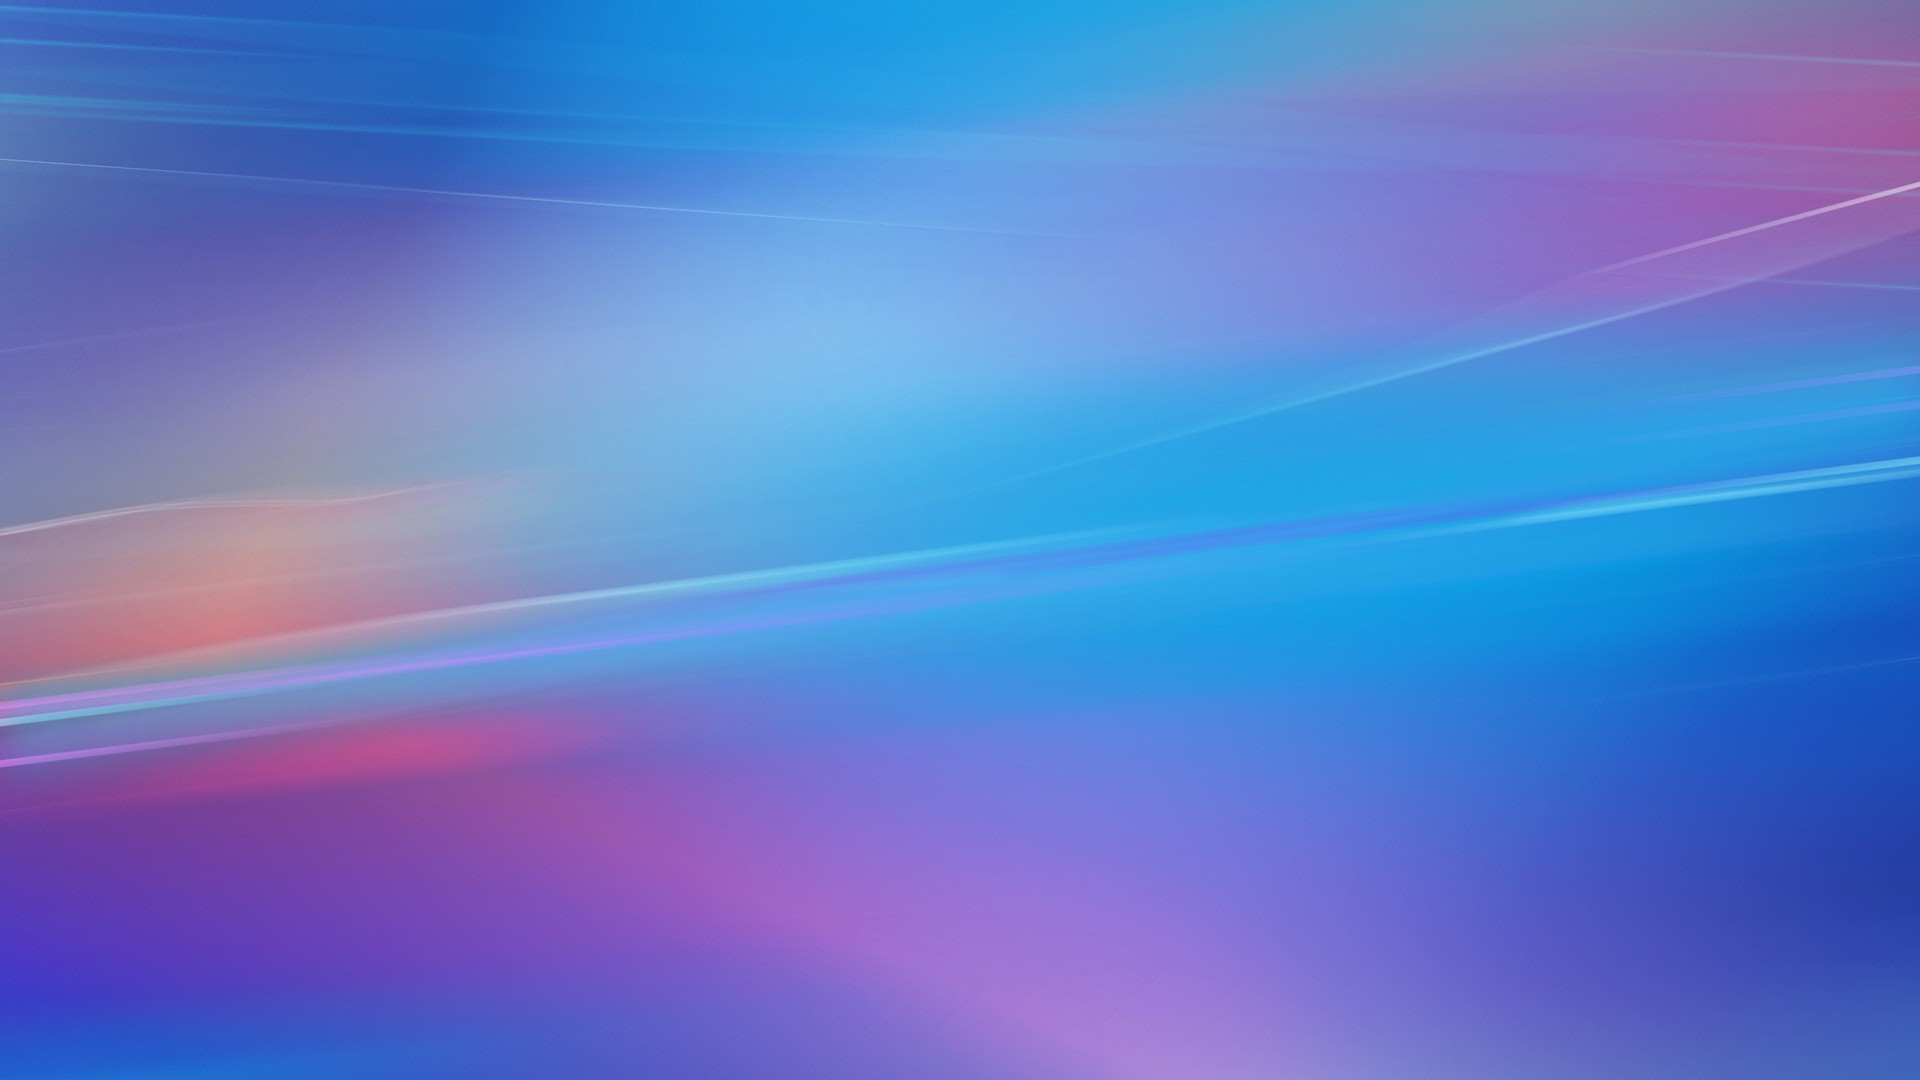 Translucent 1080p Wallpaper